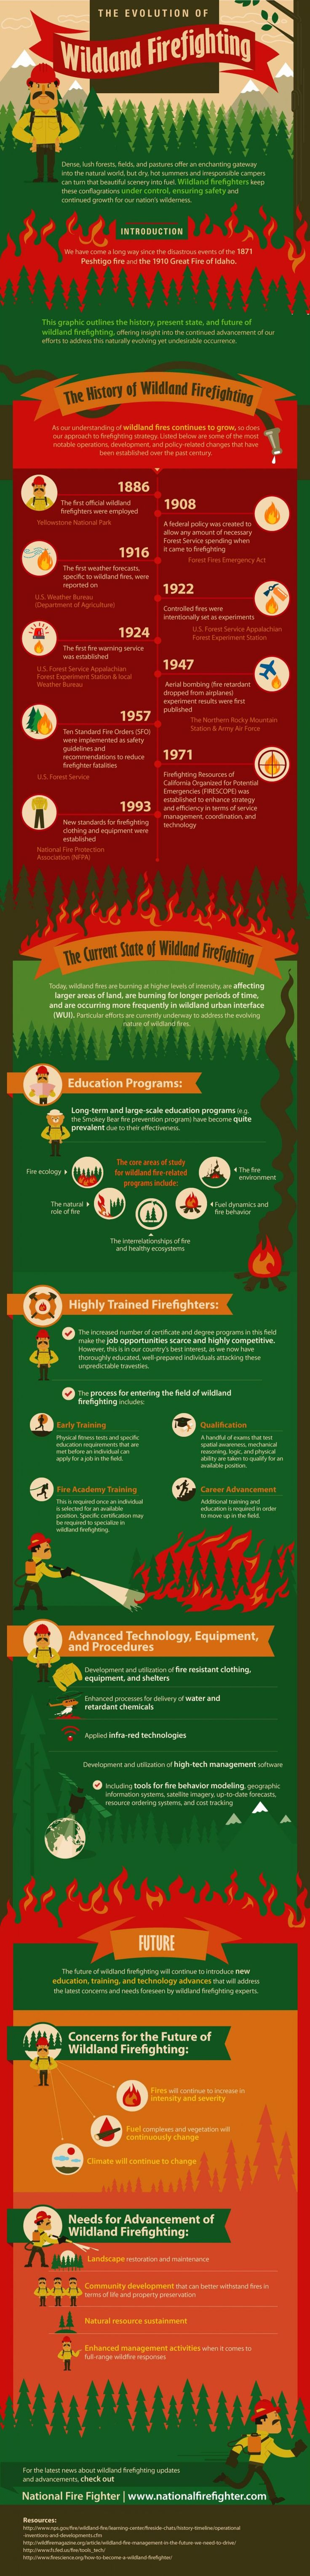 The Evolution of Wildland Firefighting Infographic